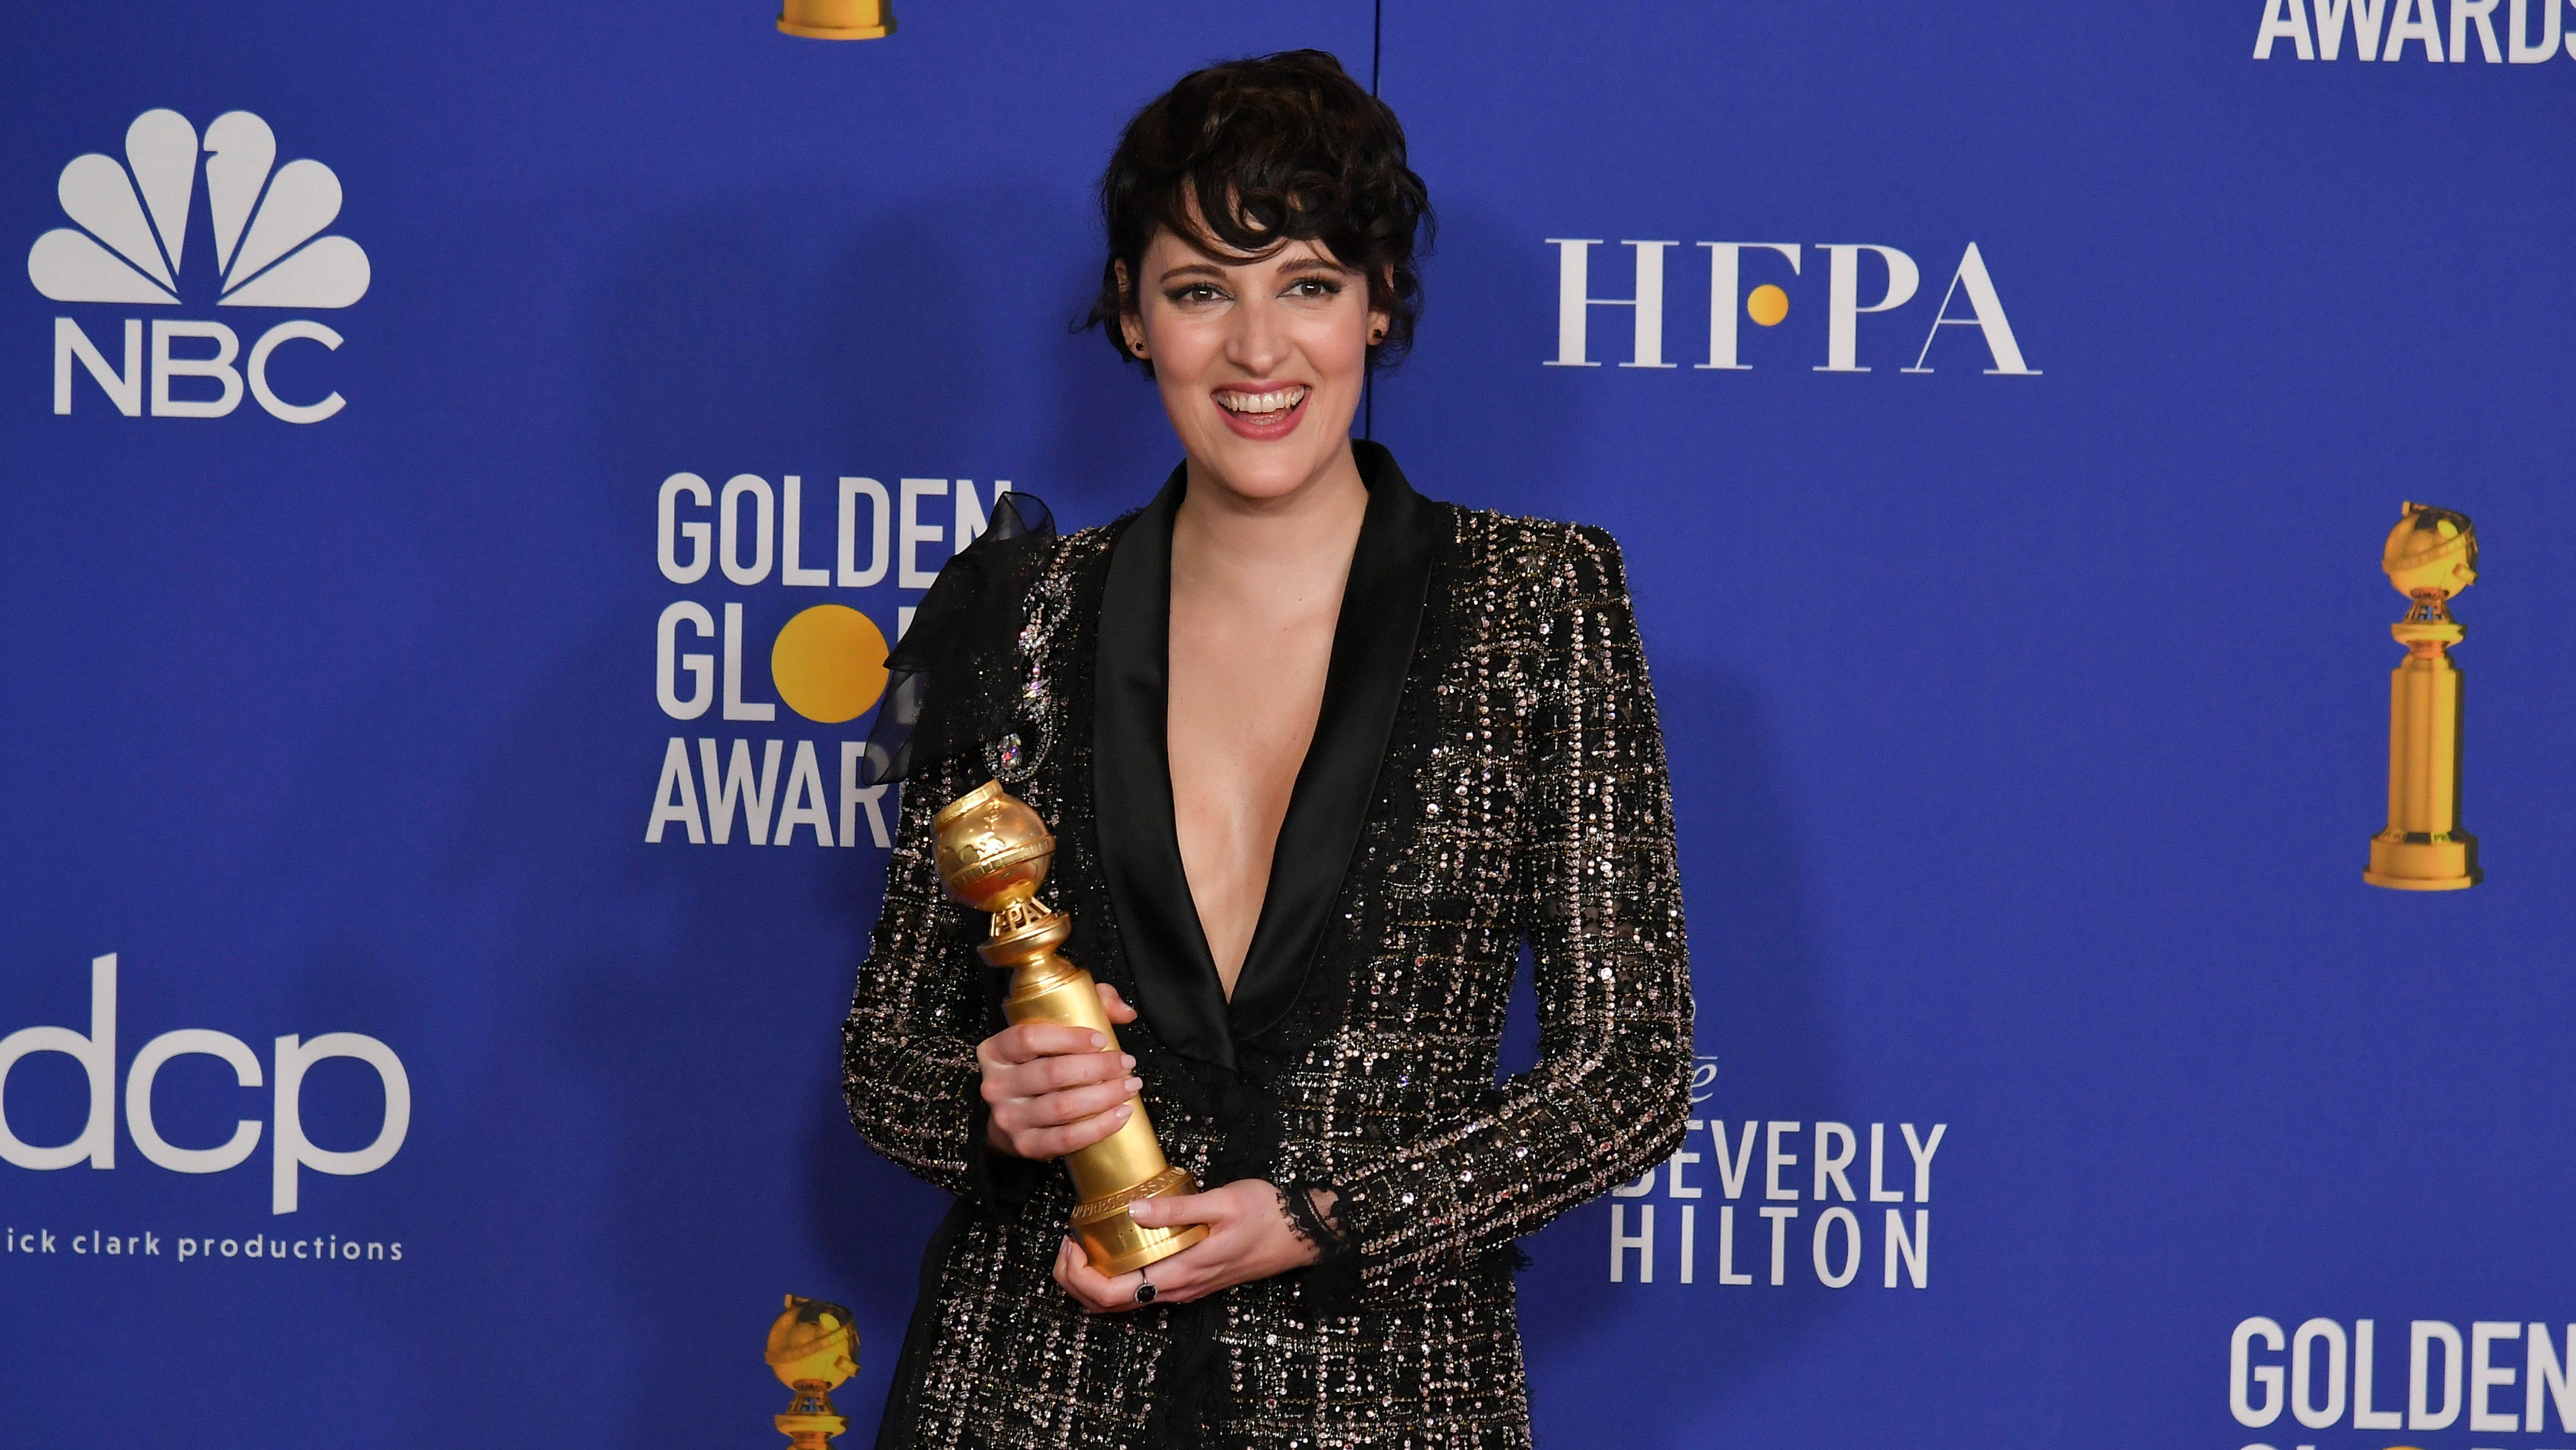 Phoebe Waller-Bridge Still Firm On No Season 3 For 'Fleabag' Even After  Golden Globe Wins – Deadline